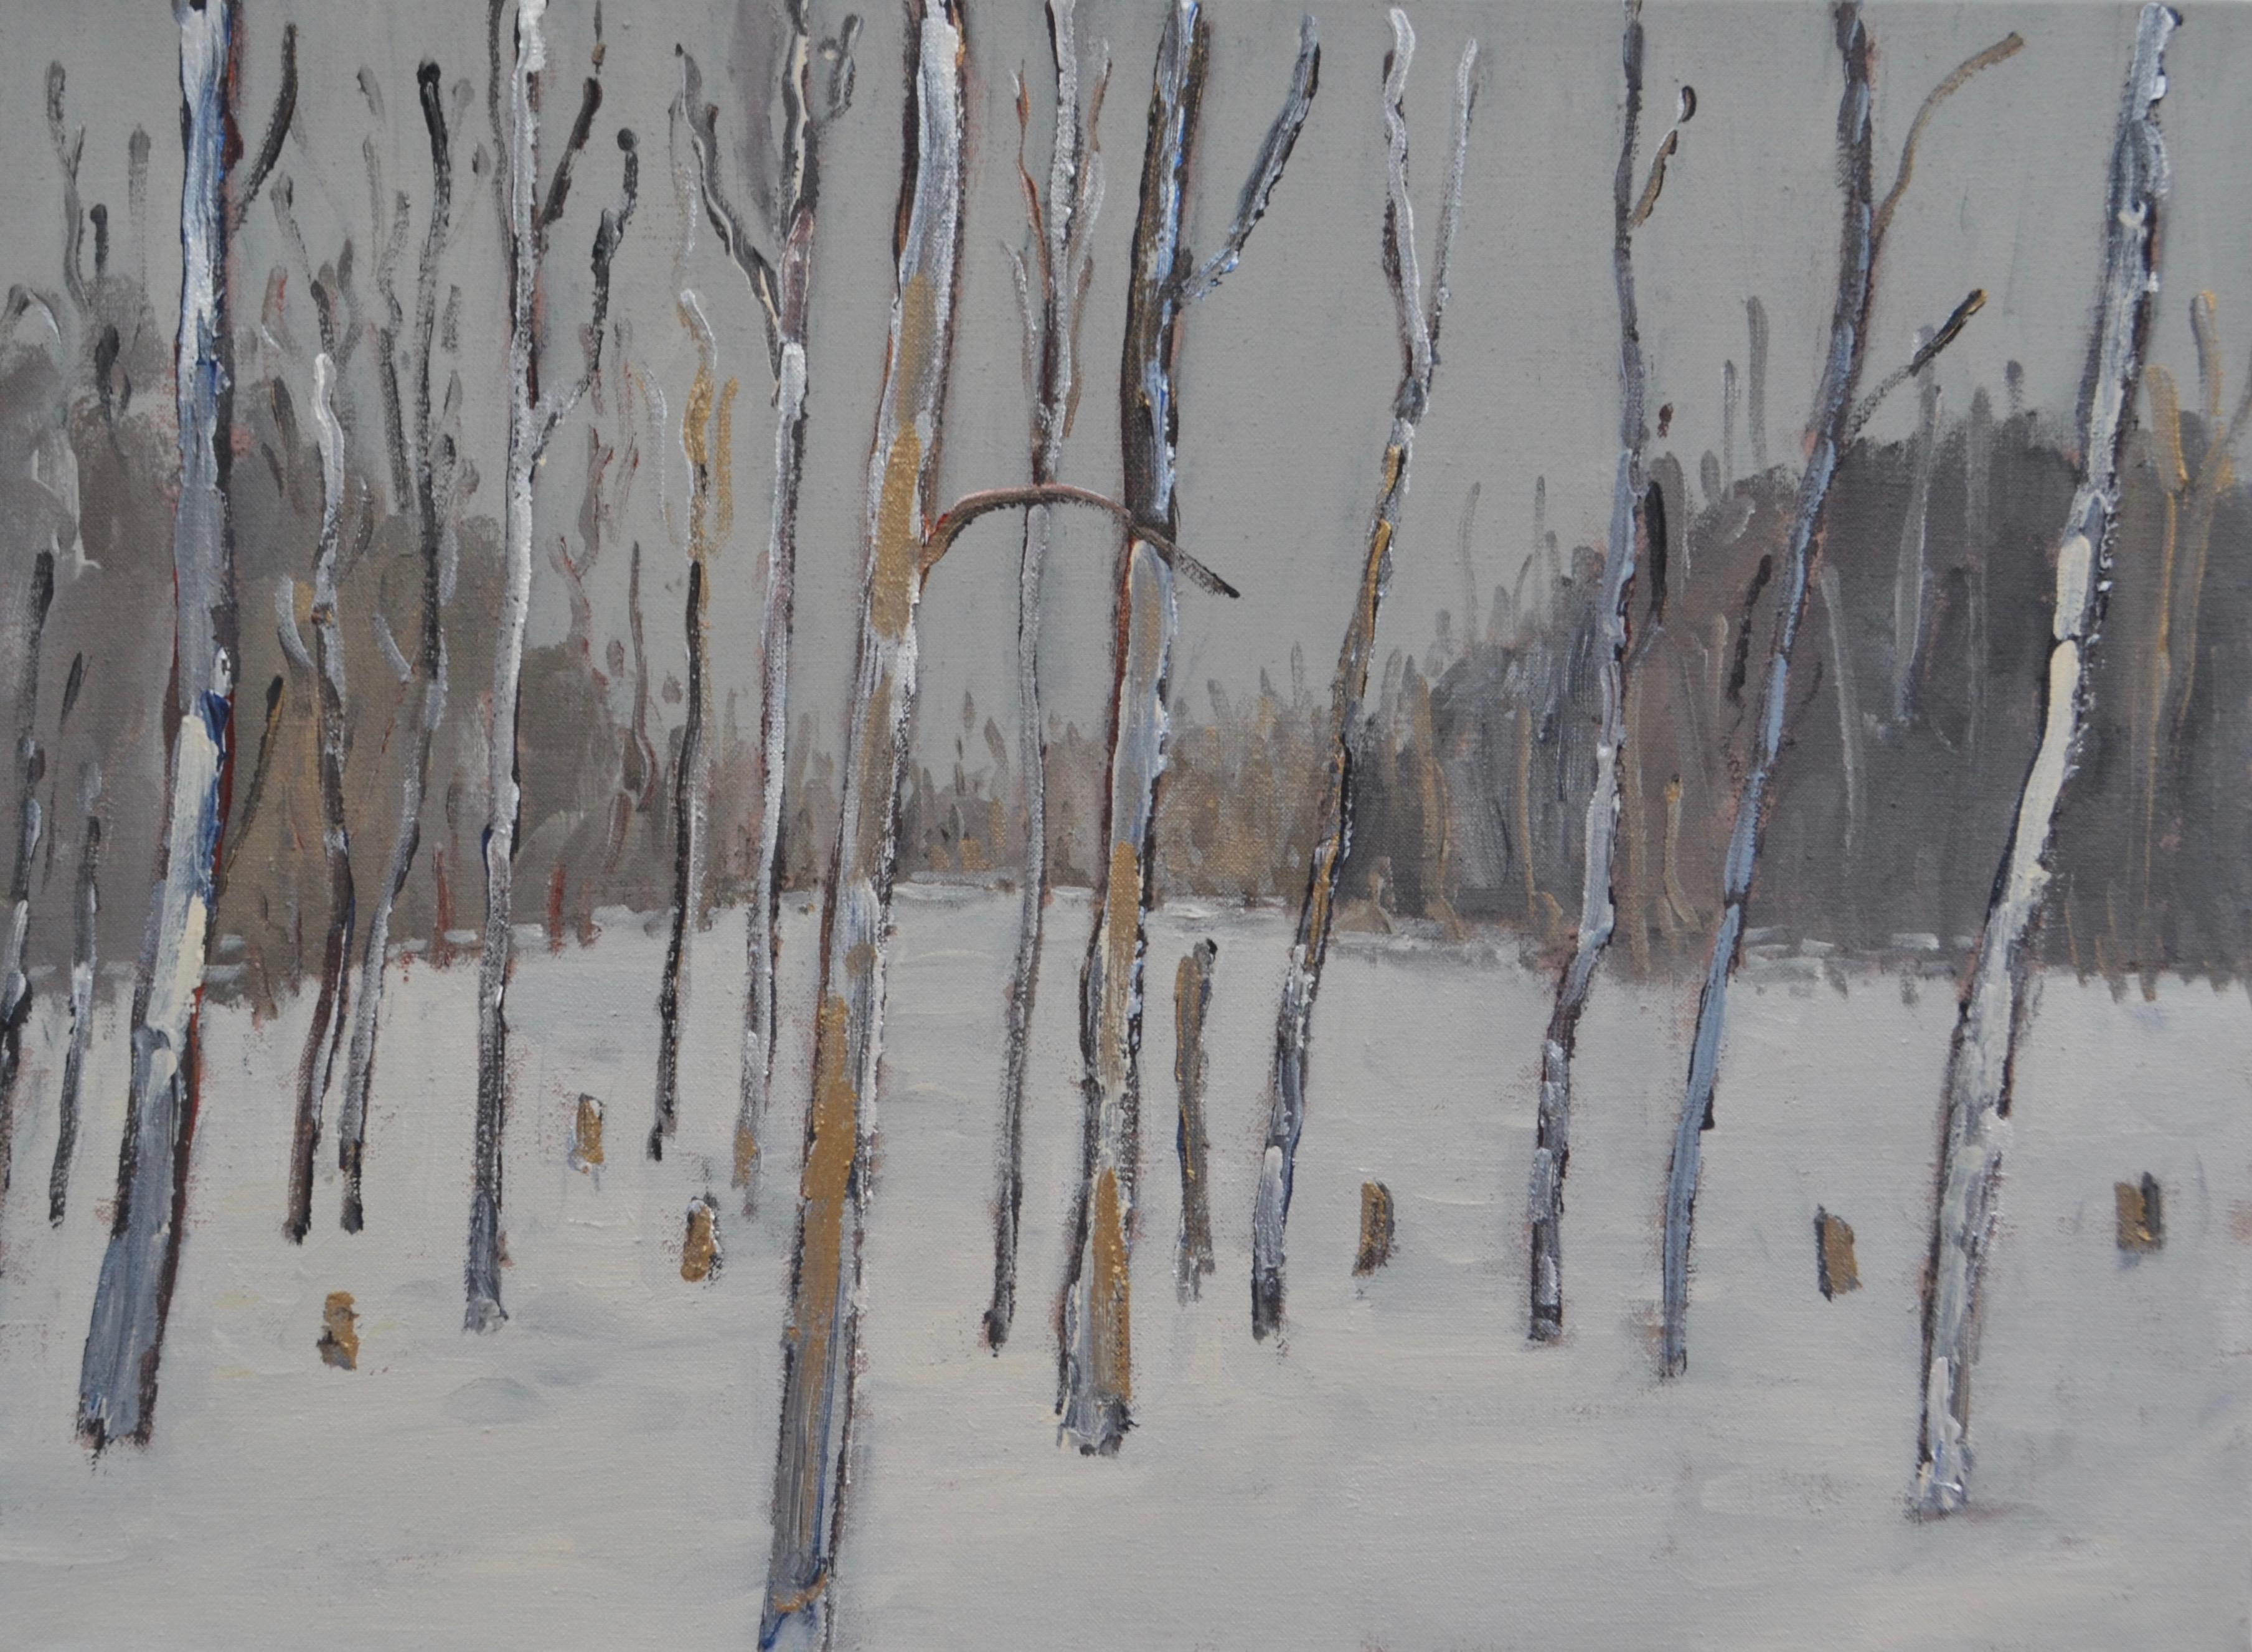 Winter Trees 2017 acrylic on linen 22_ x 30_